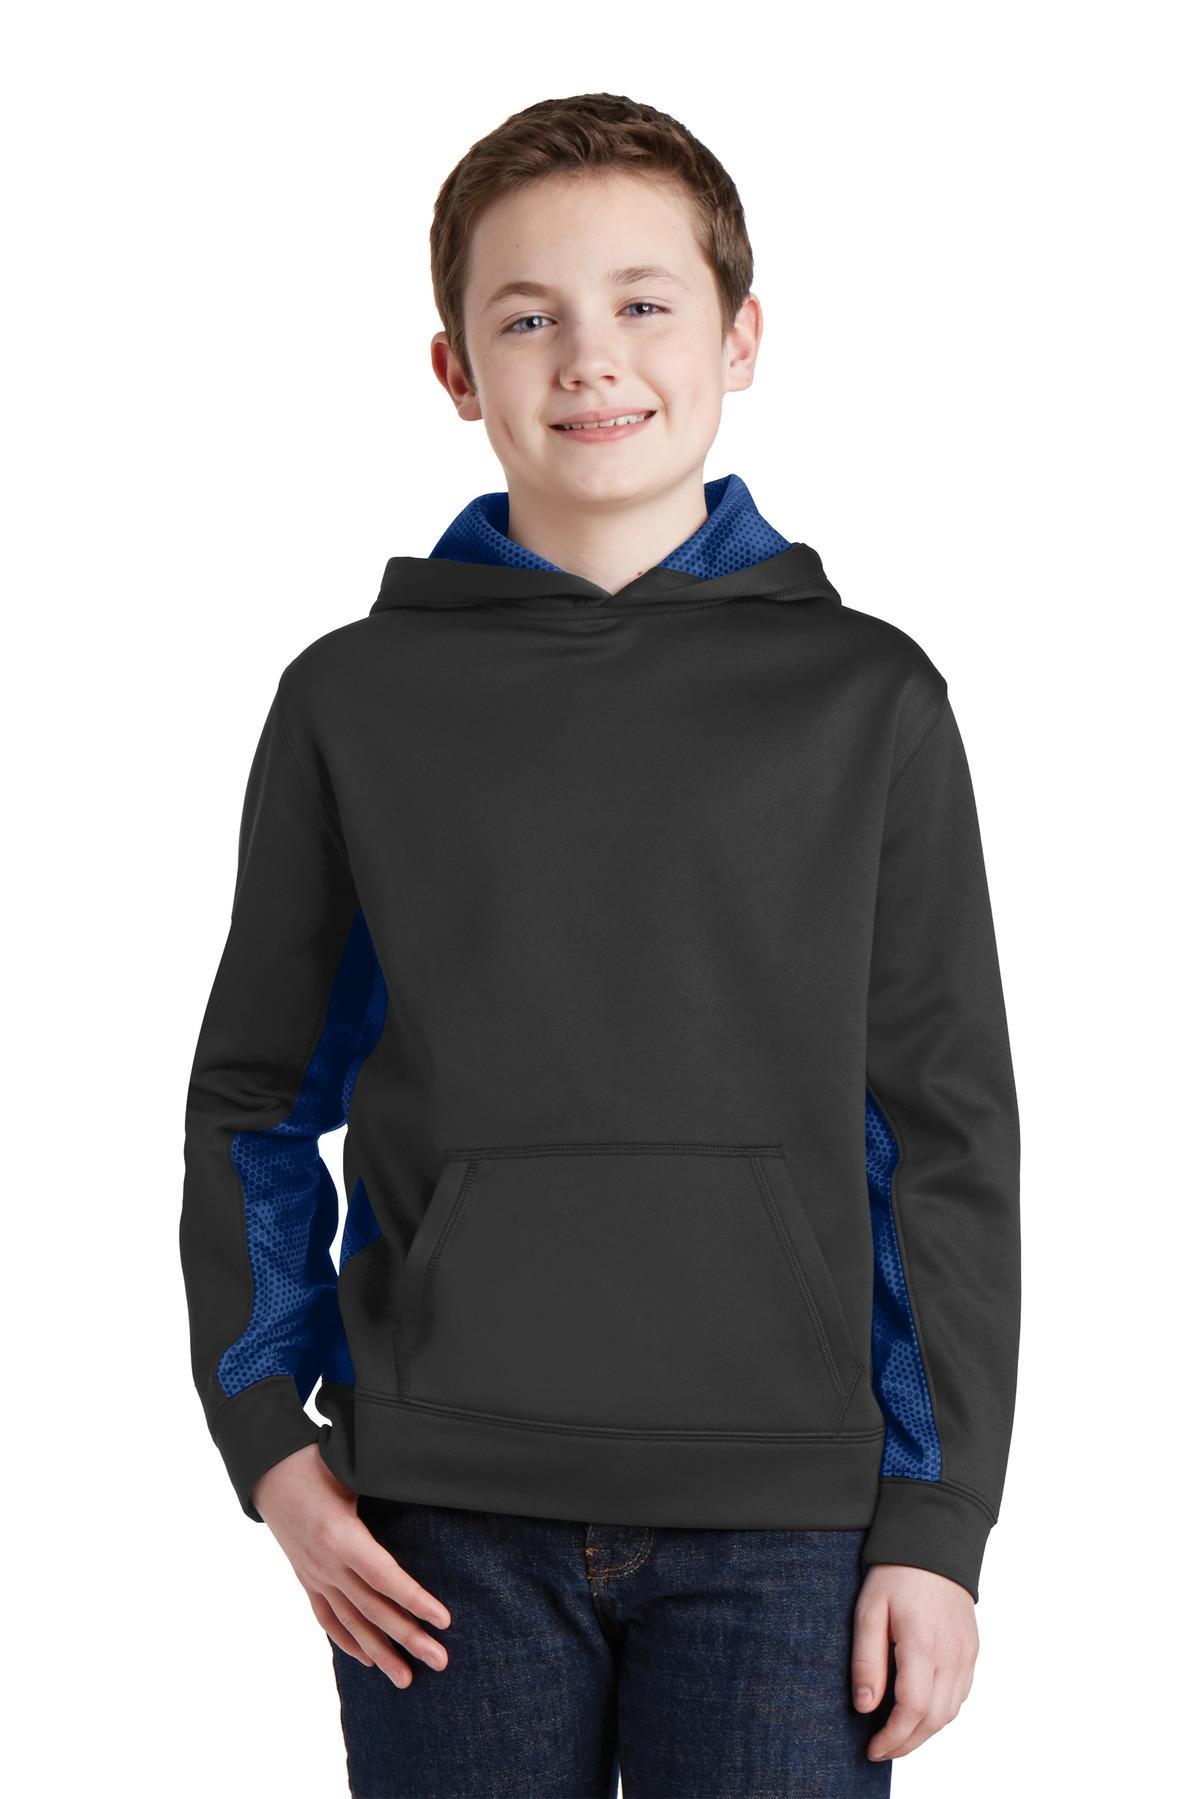 Sport-Tek  Youth Sport-Wick  YST239 - CamoHex Fleece Colorblock Hooded Pullover